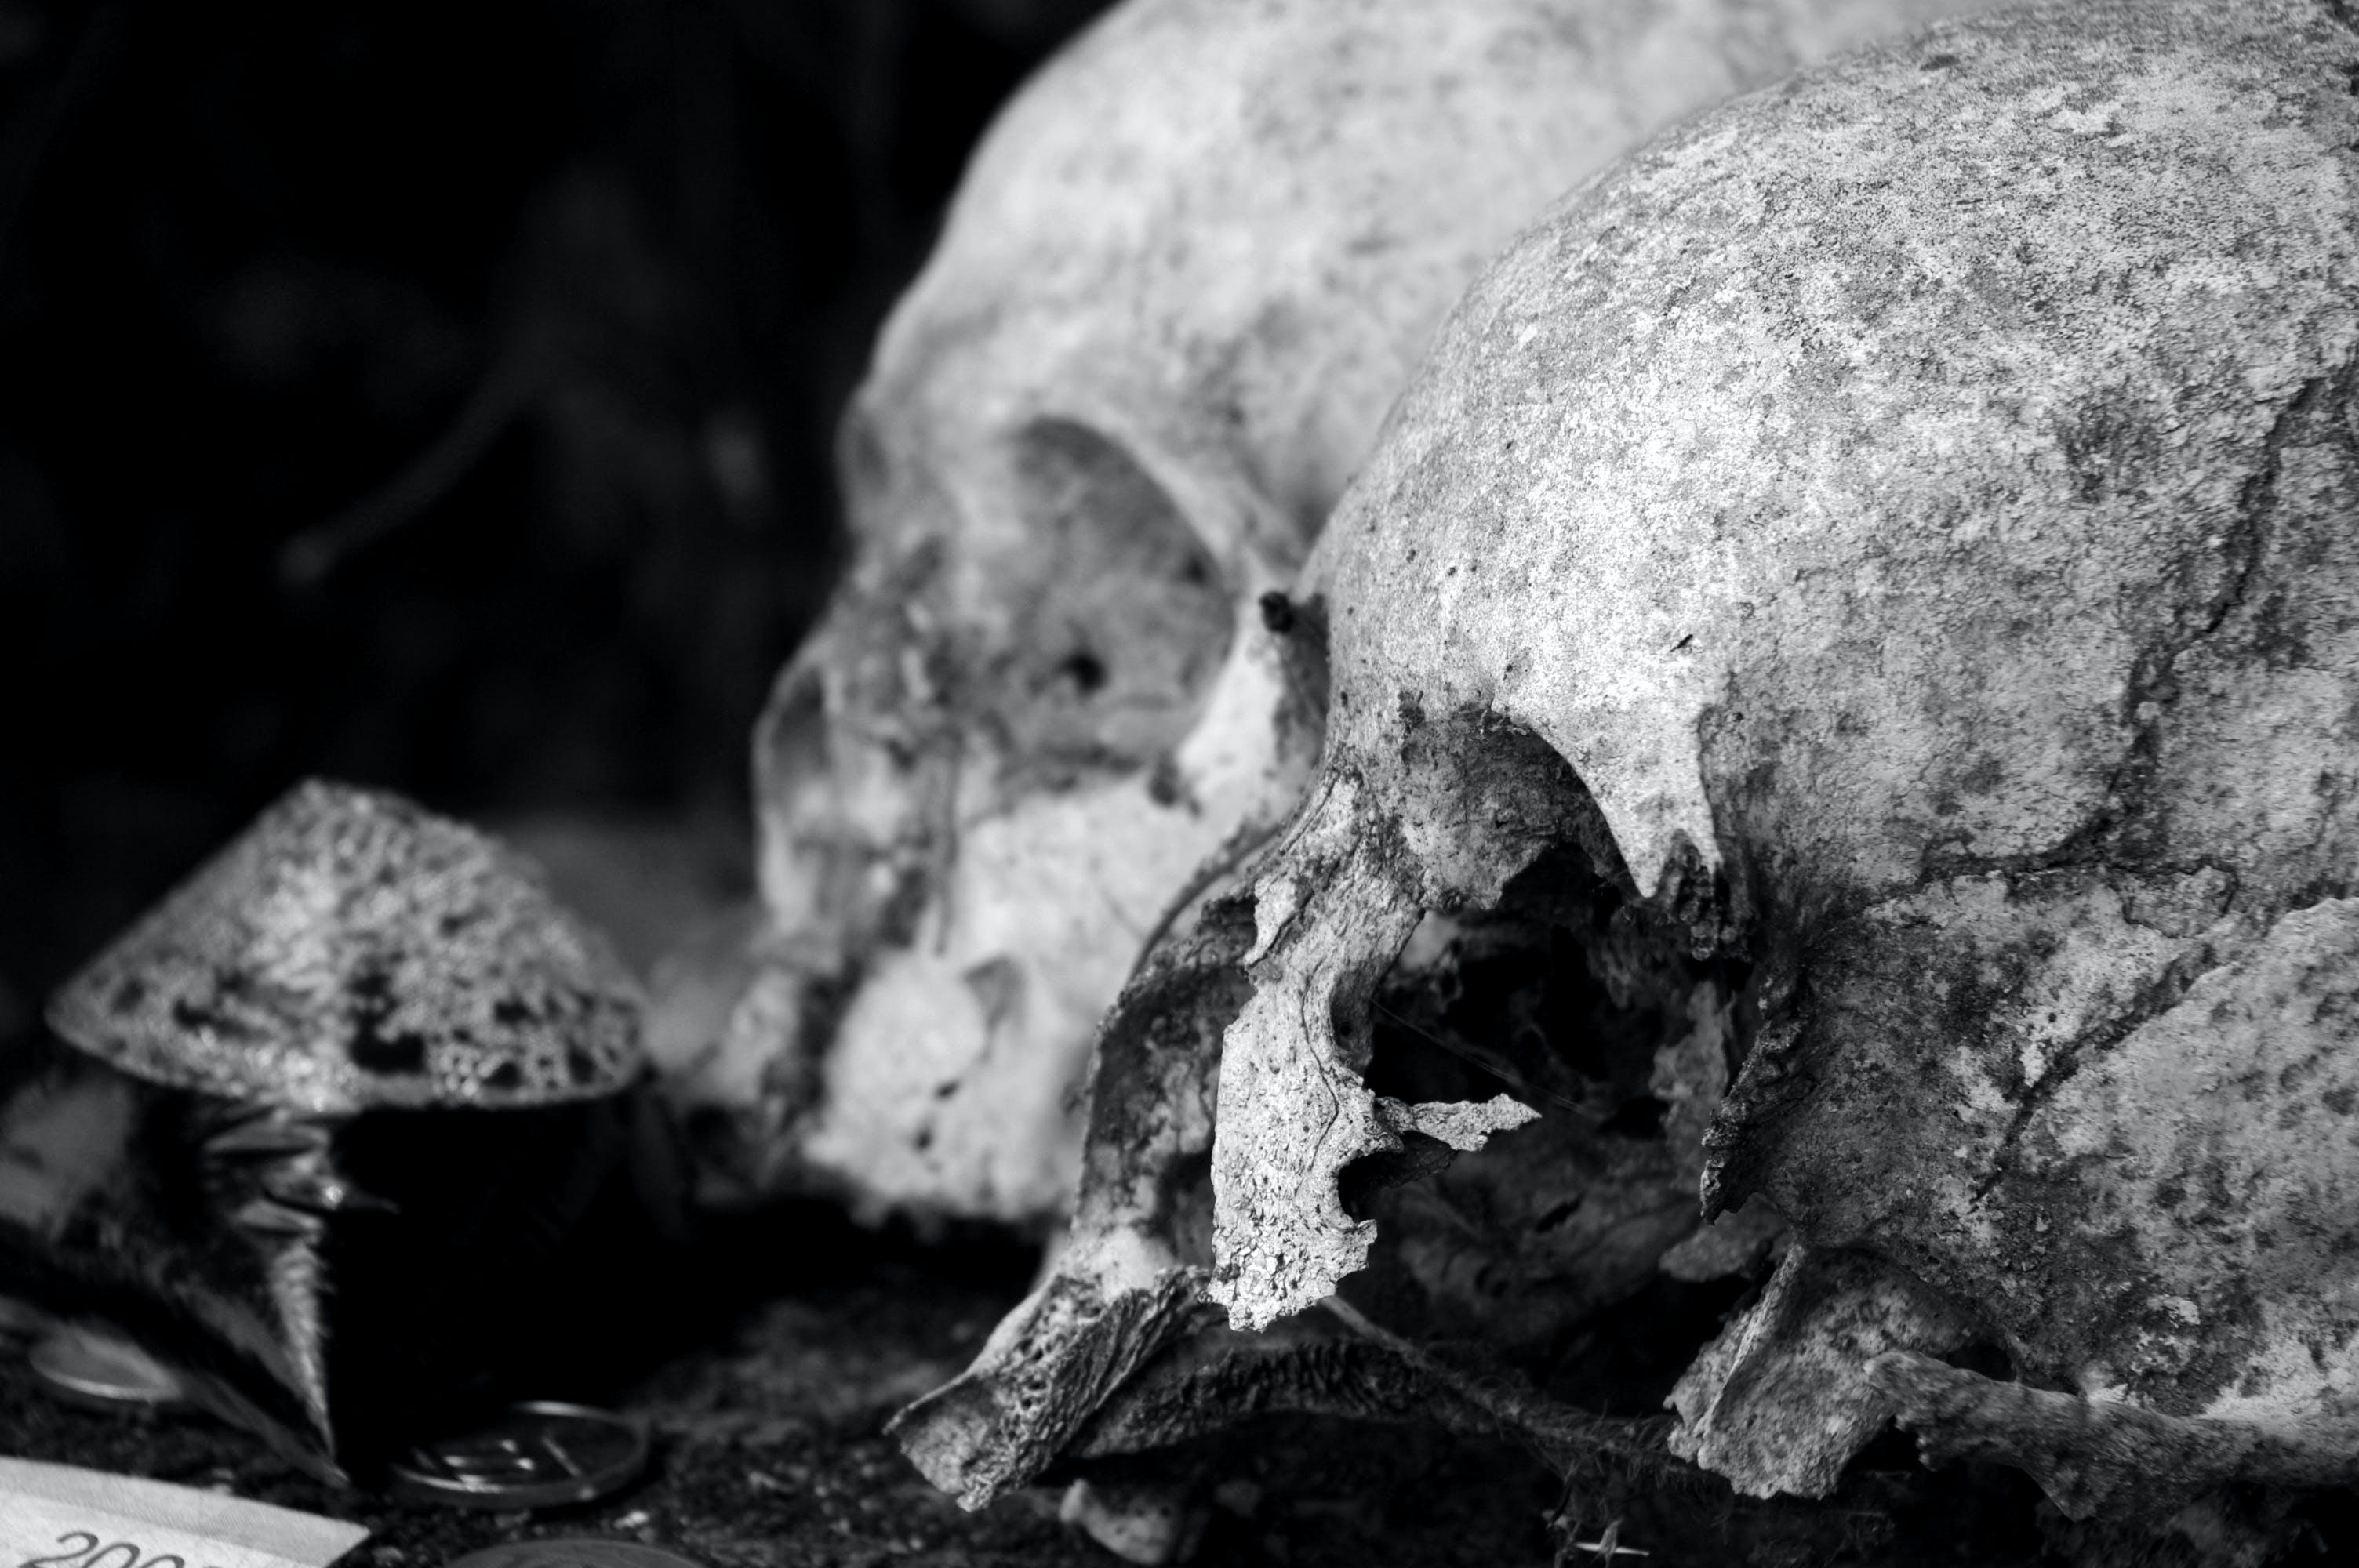 Free stock photo of black and white, bones, death, skulls